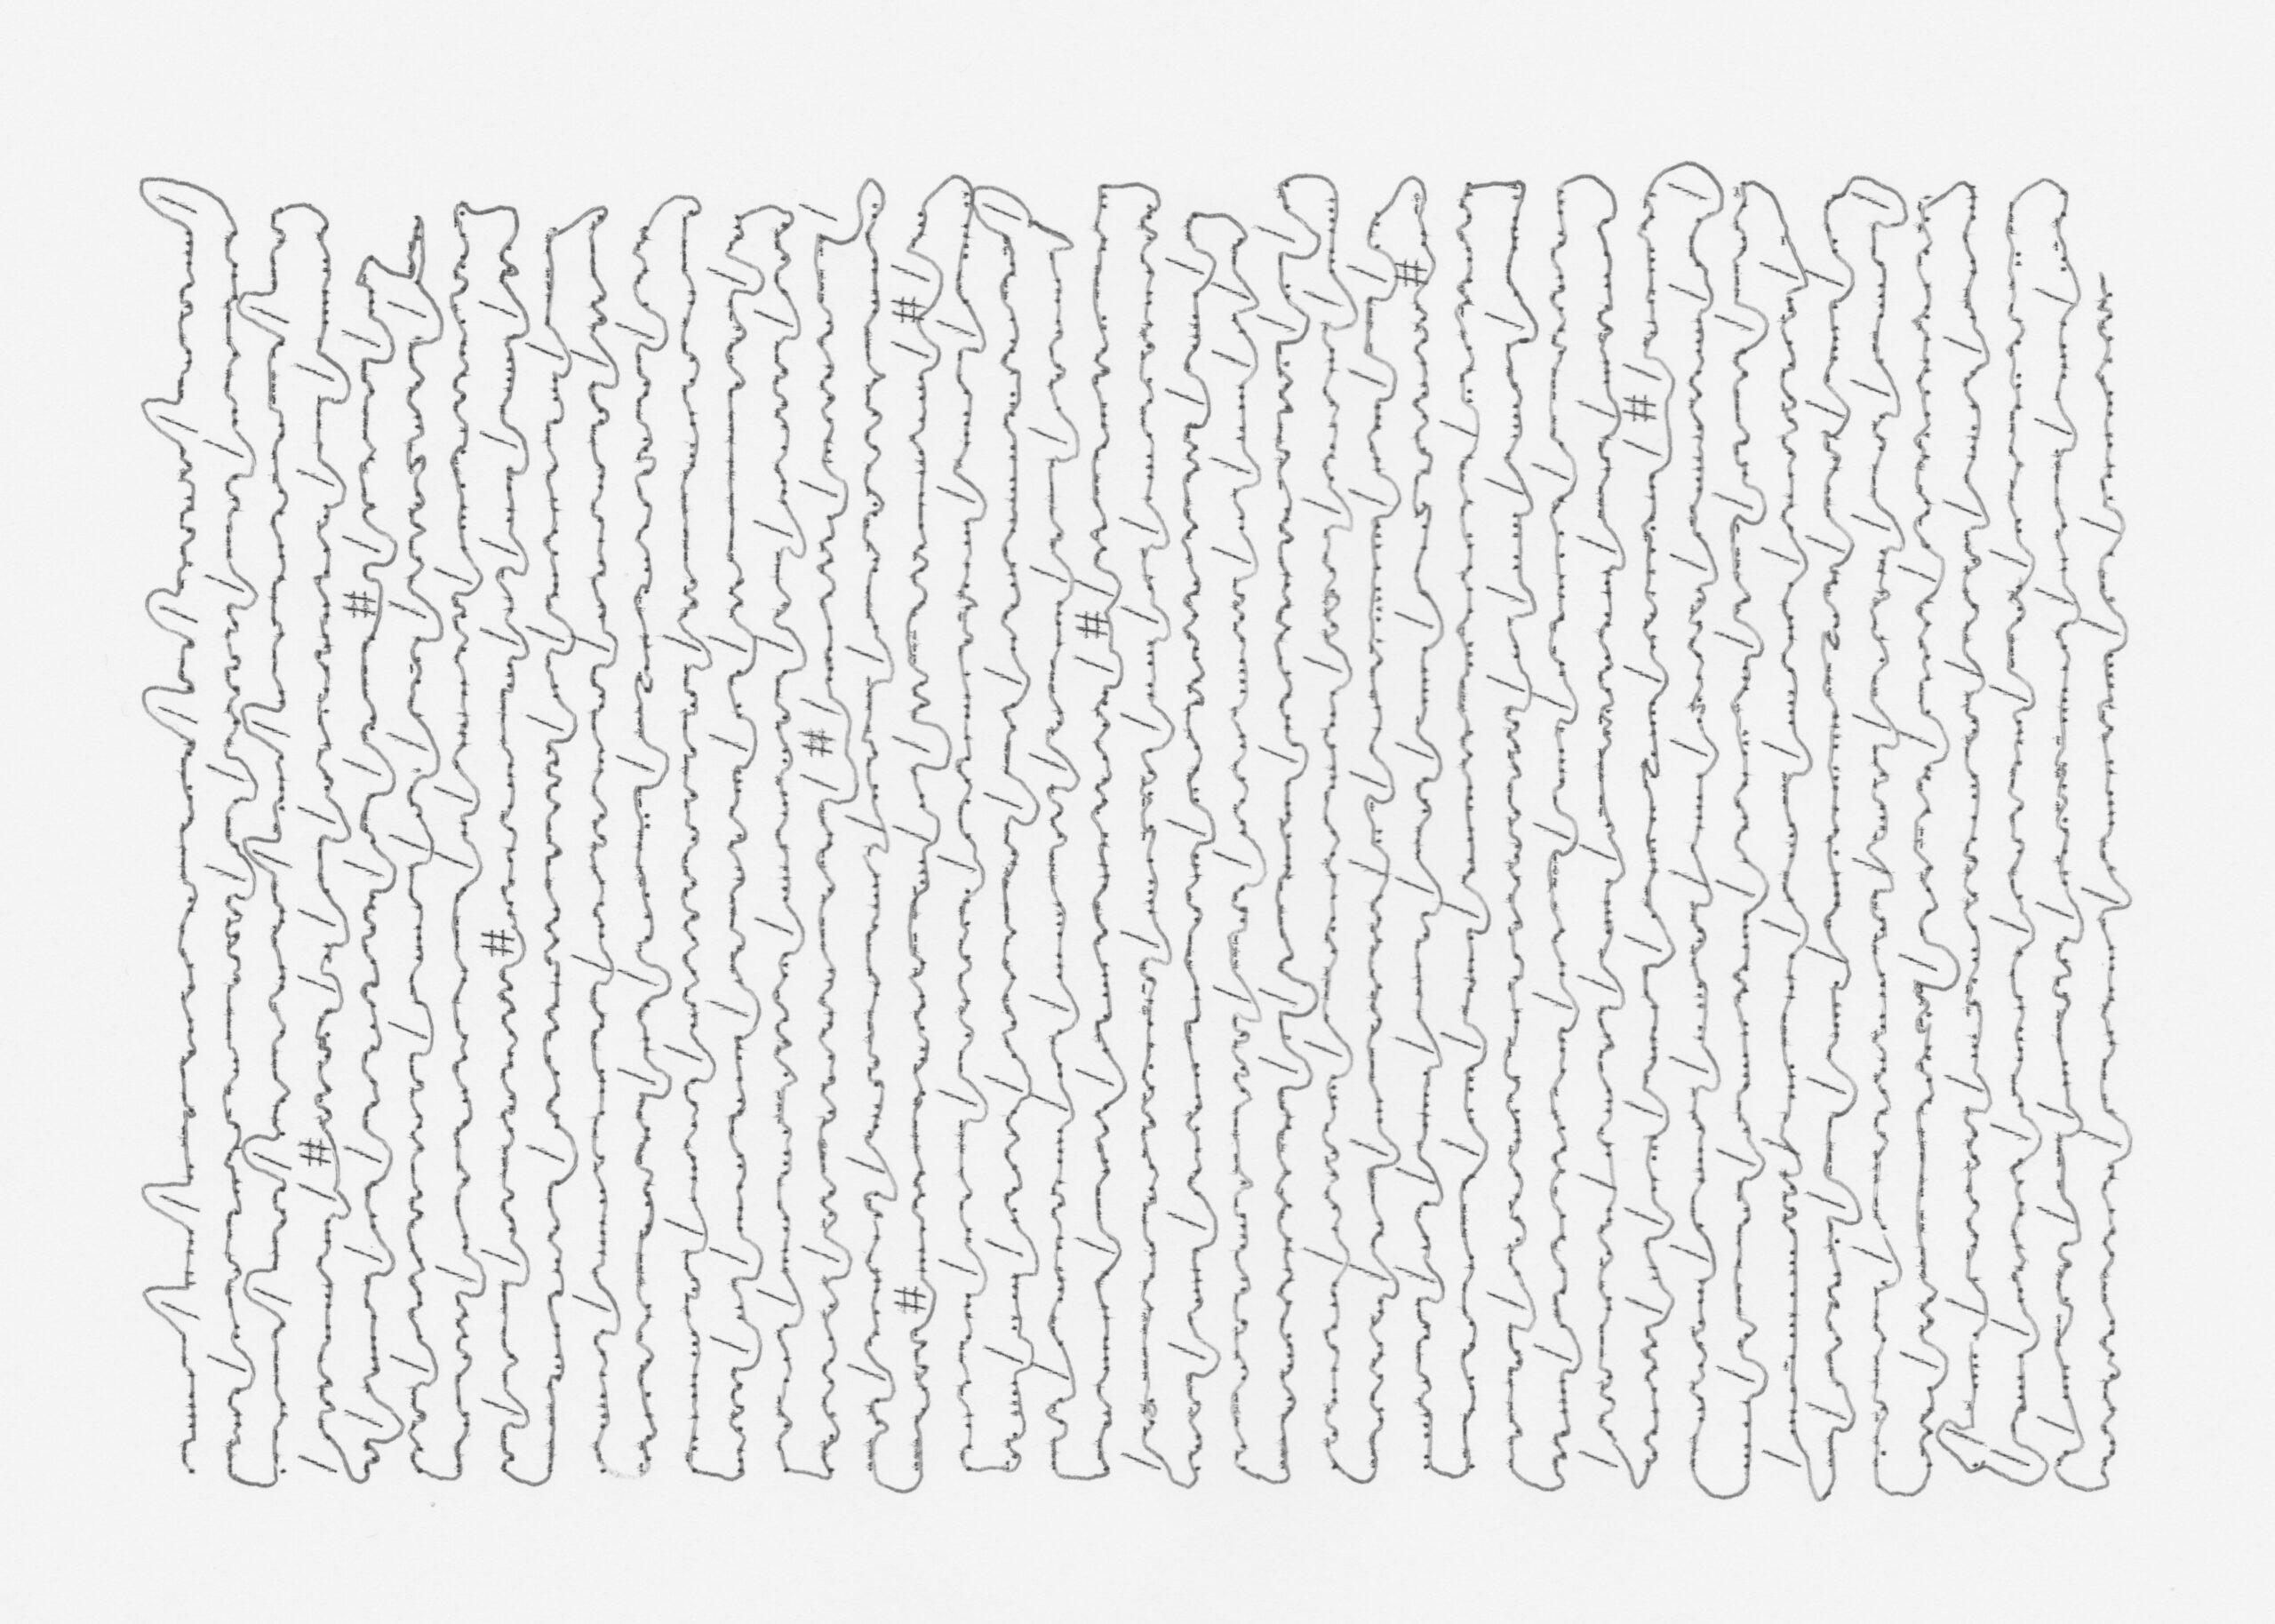 A_2020_04_23_scans_total_morseknittingScan-9